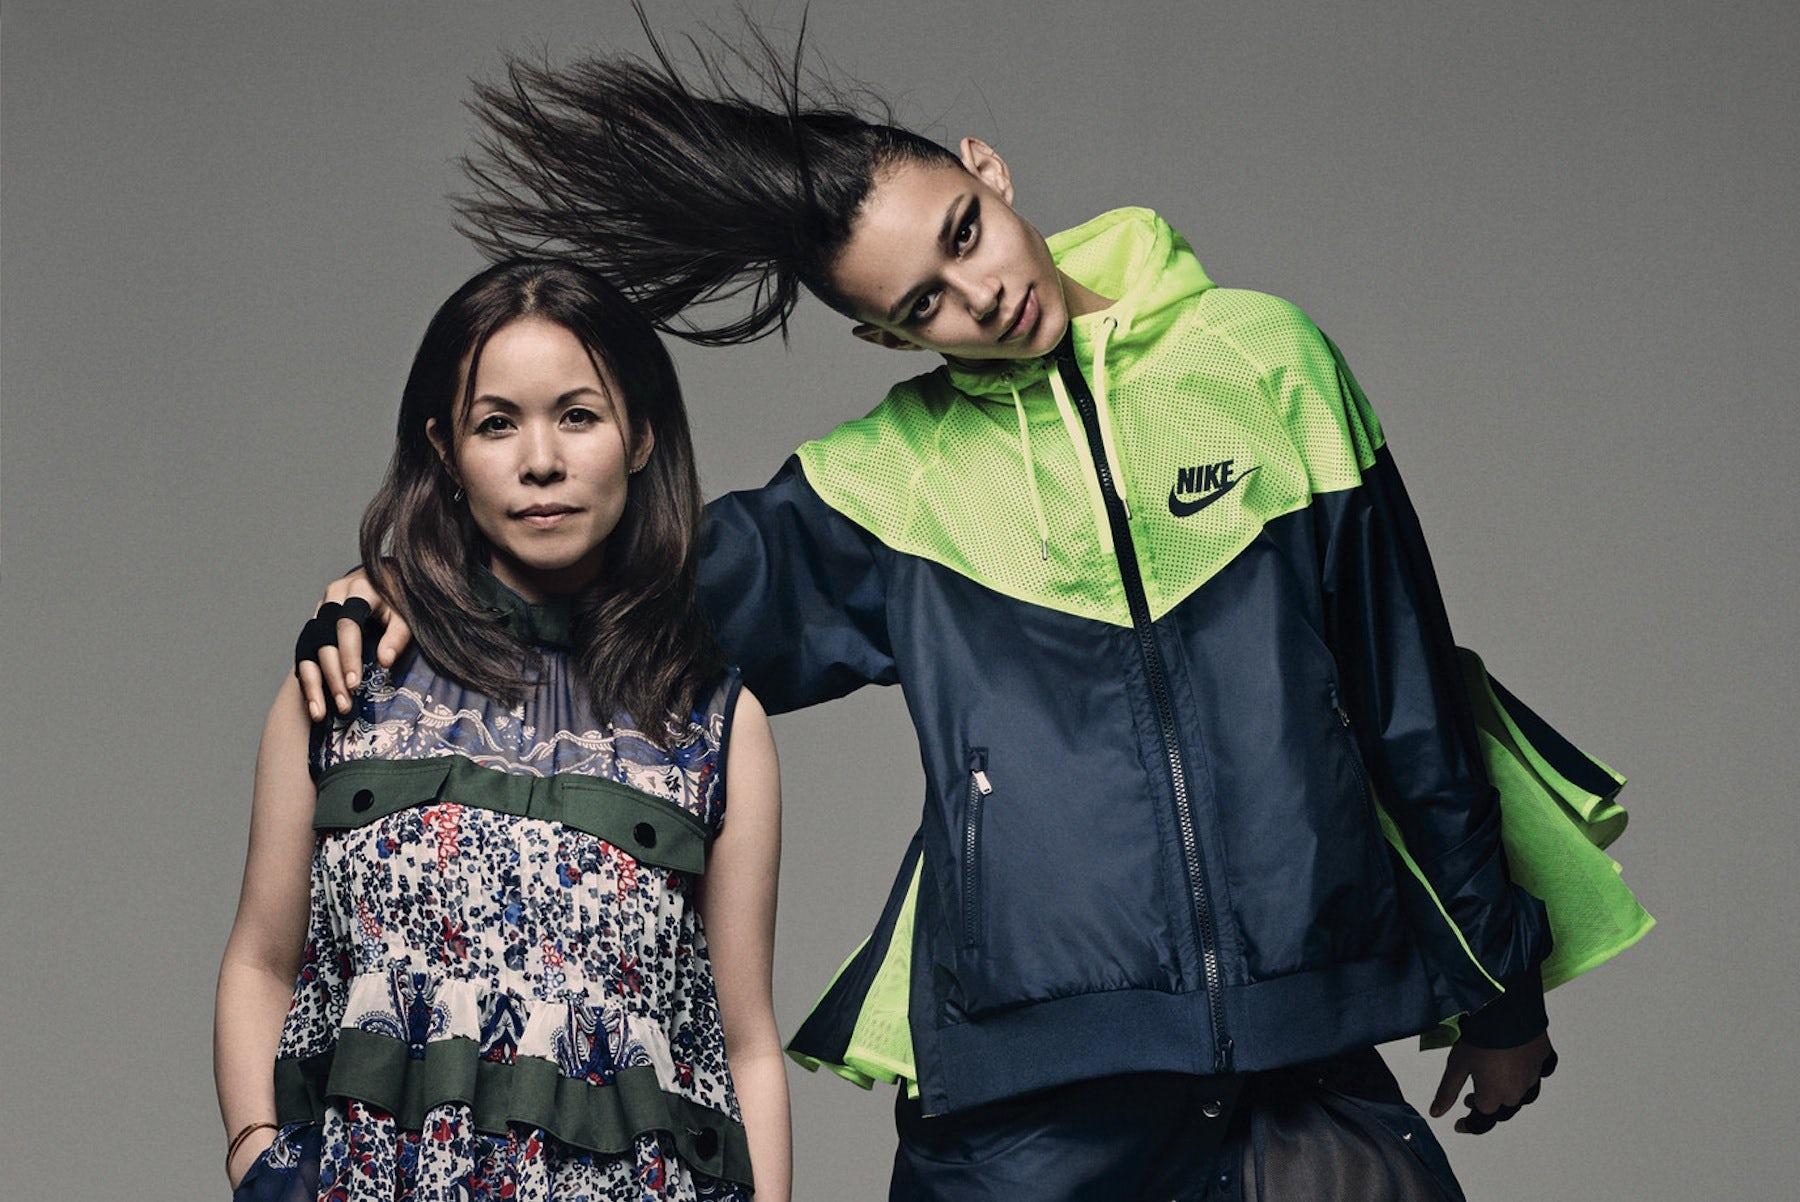 Sacai designer Chitose Abe with model Binx Walton wearing Nike x Sacai | Photo: Craig McDean